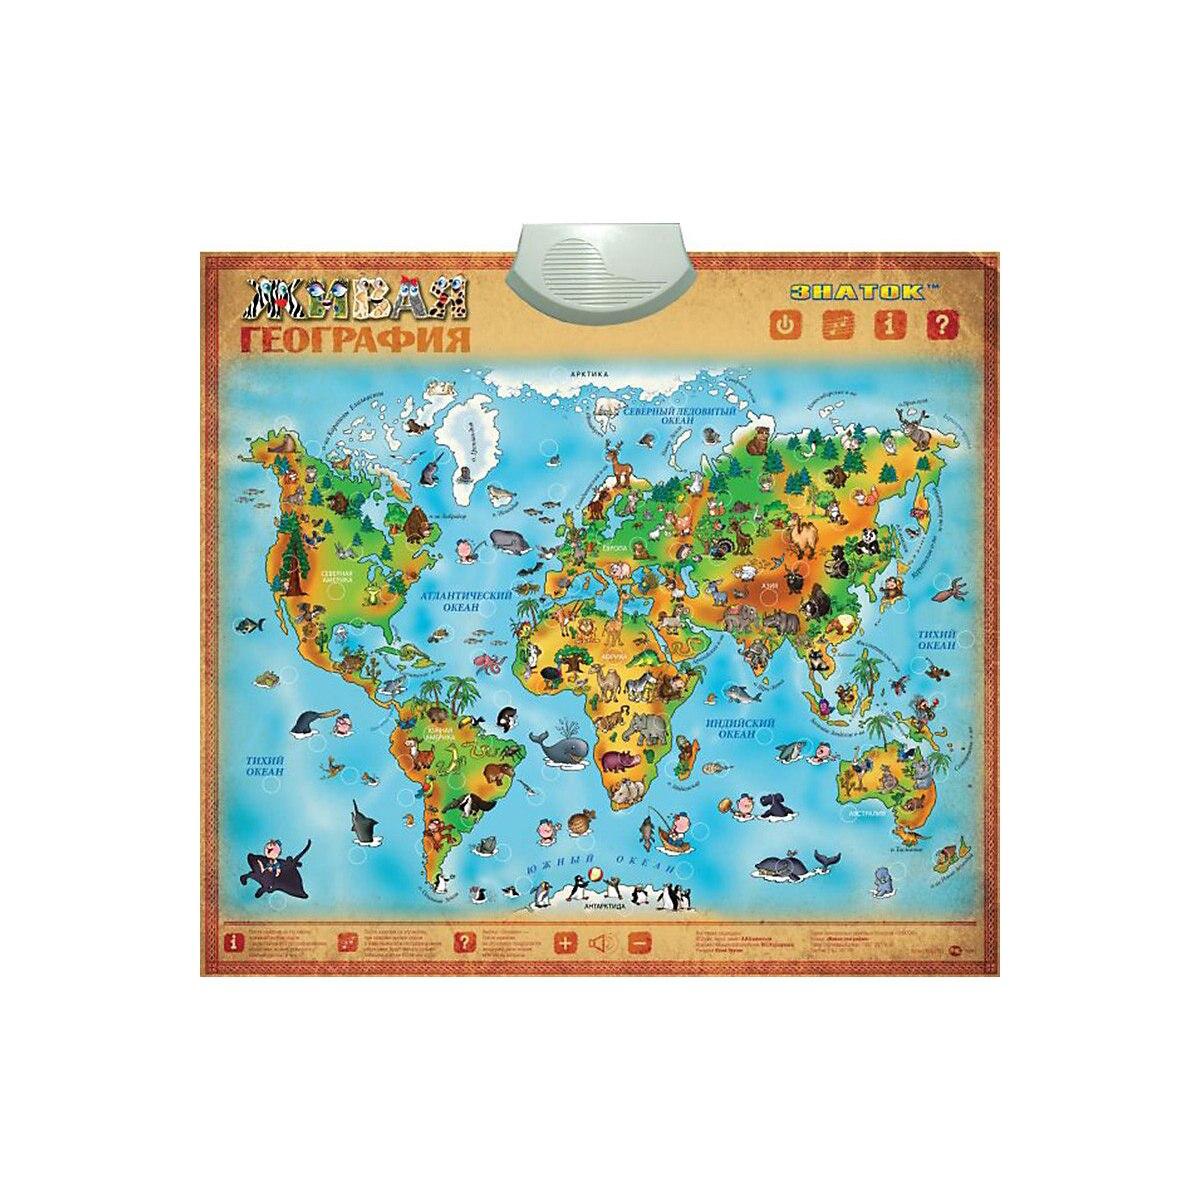 ZNATOK Learning Machine 2403206 educational game interactive toys children toy MTpromo